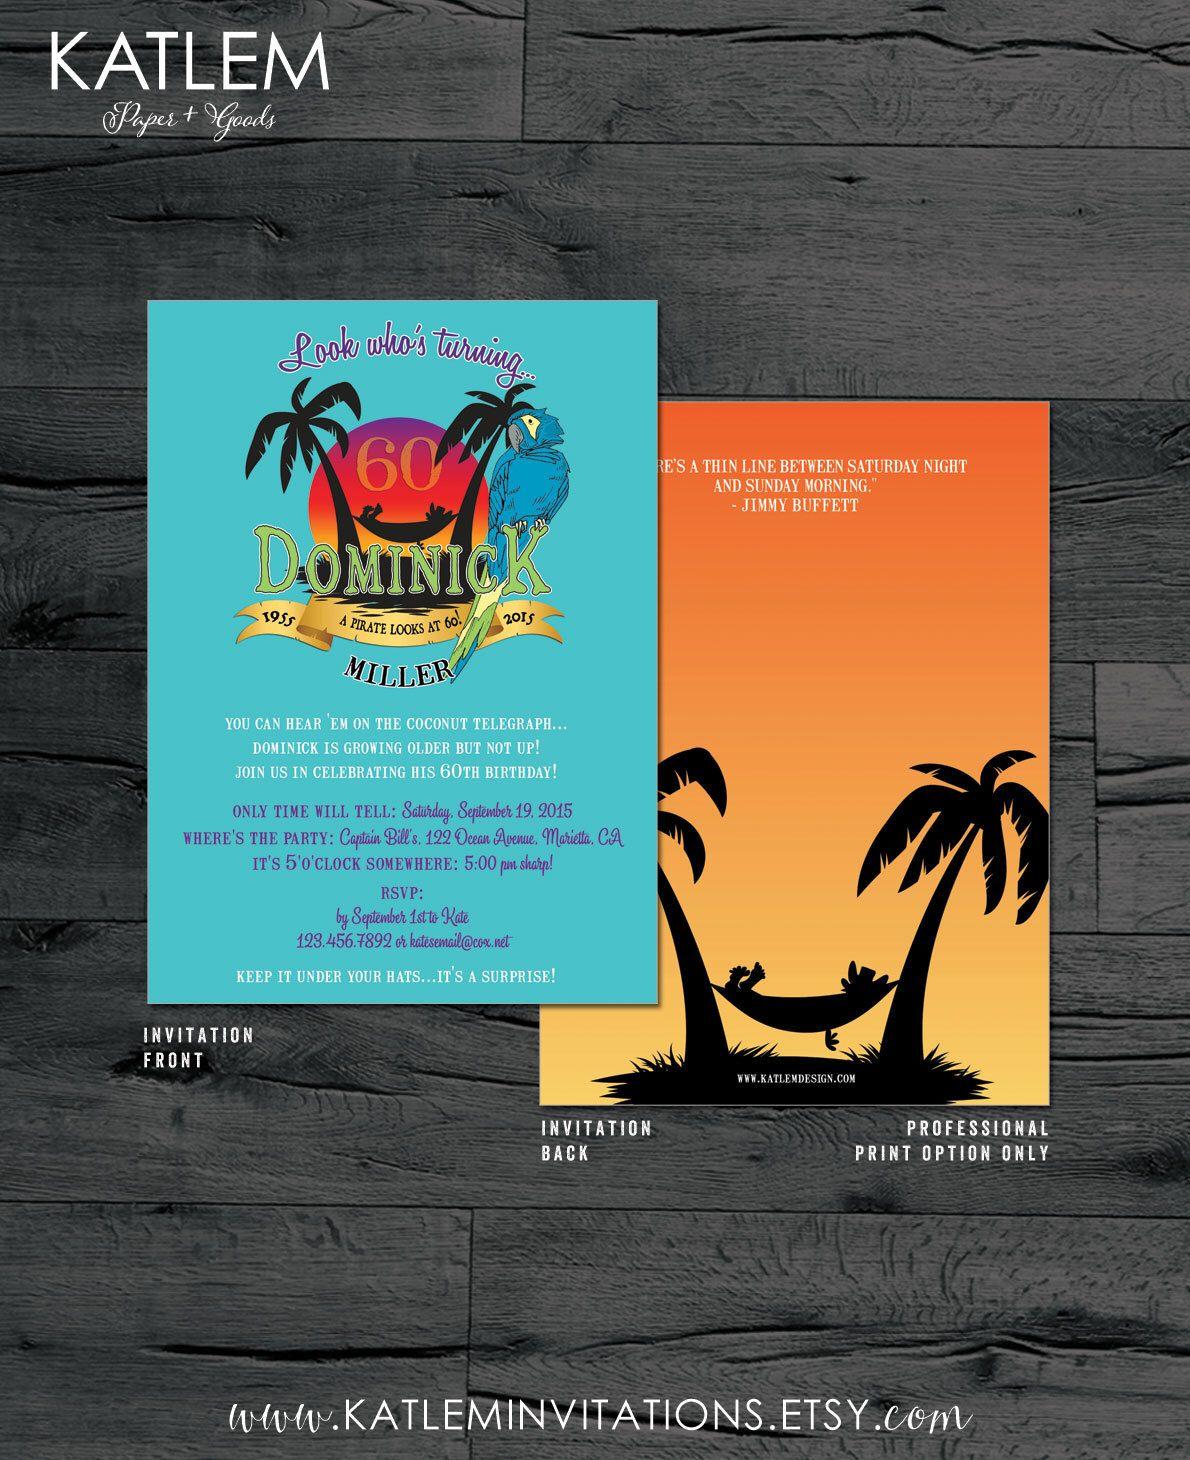 Poster design fee - Birthday Party Invitation Margaritaville Jimmy Buffet Inspired Design Fee By Katleminvitations On Etsy